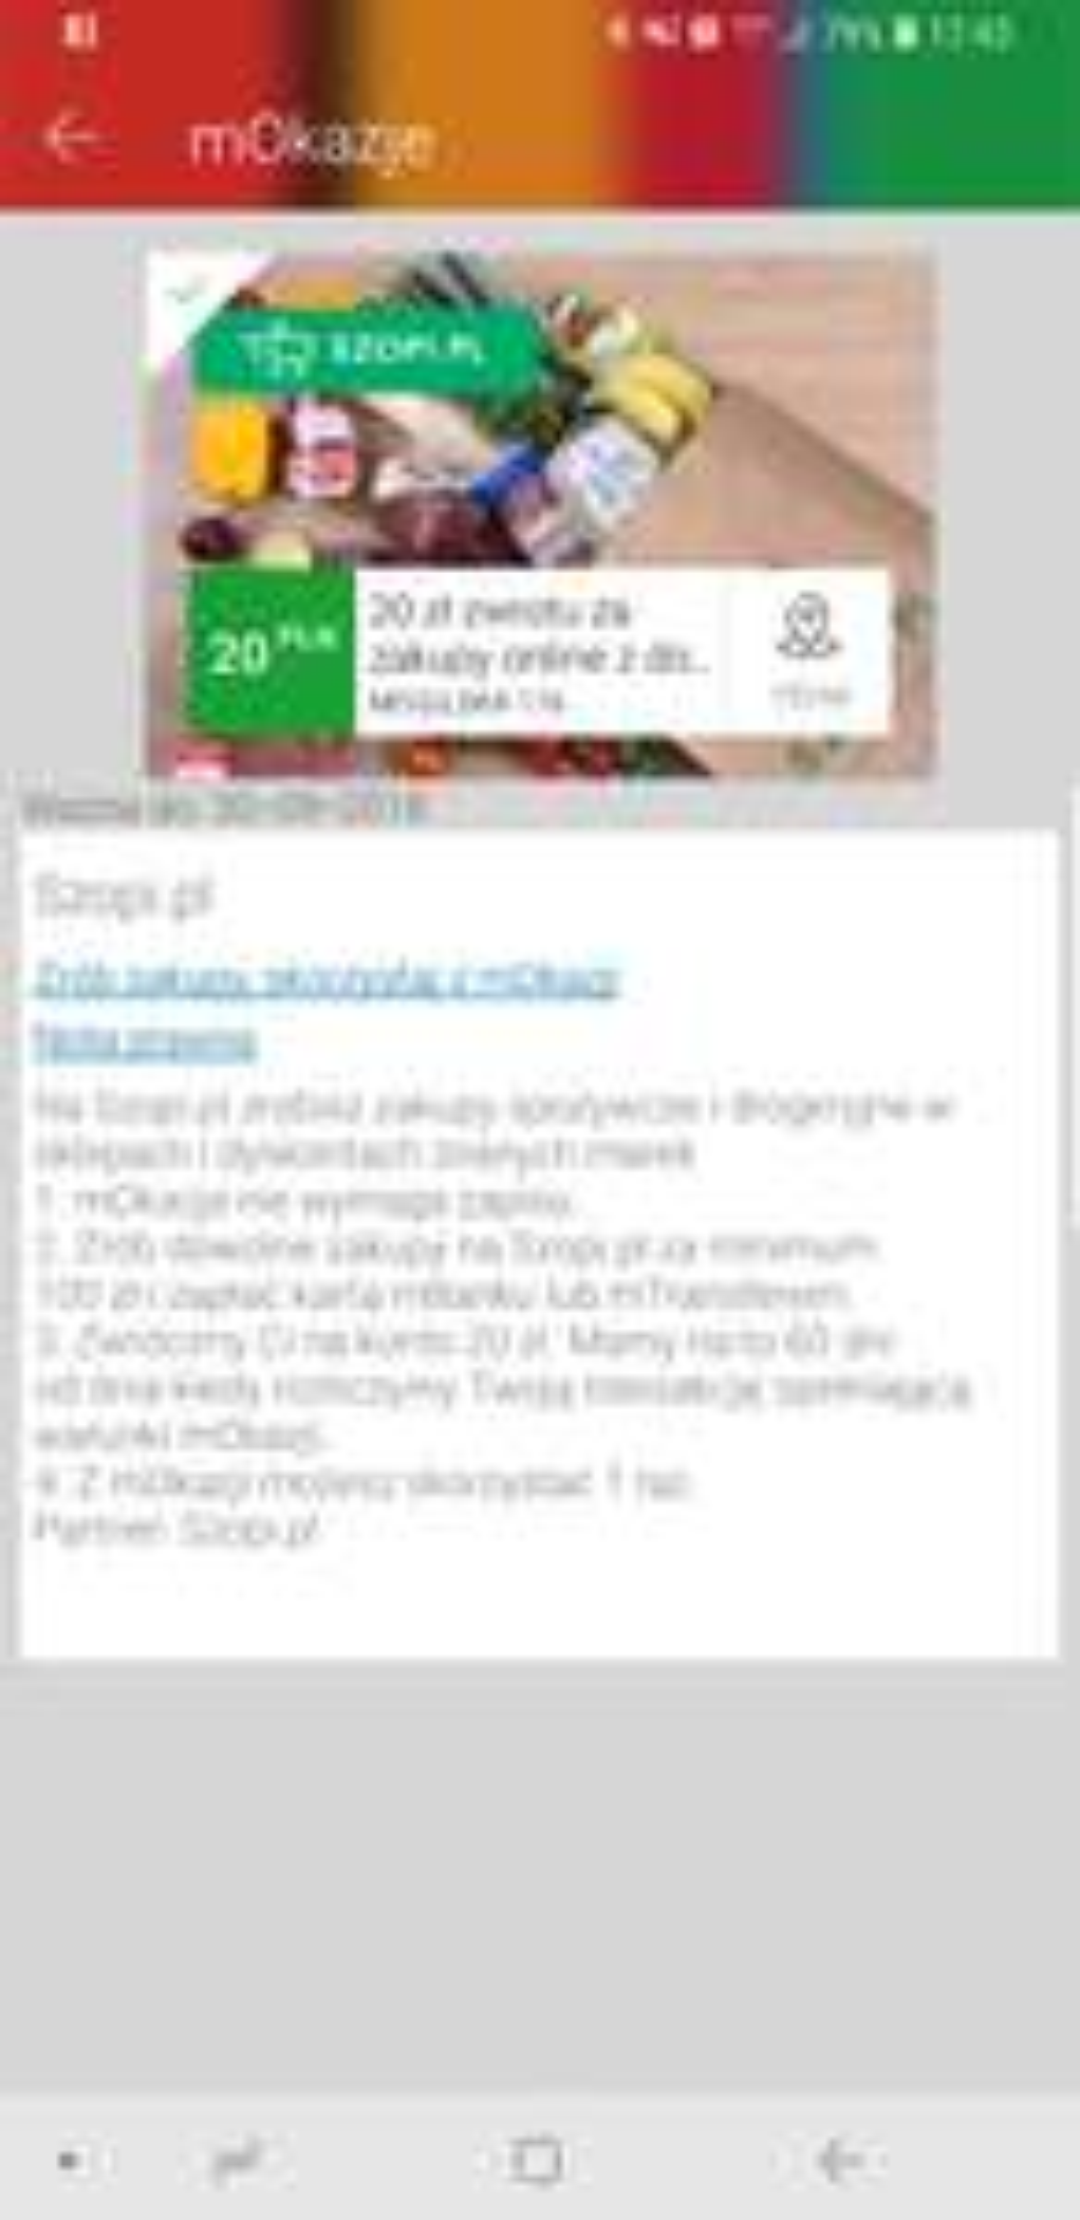 Zwrot 20 zł za zakupy na Szopi.pl | mOkazje